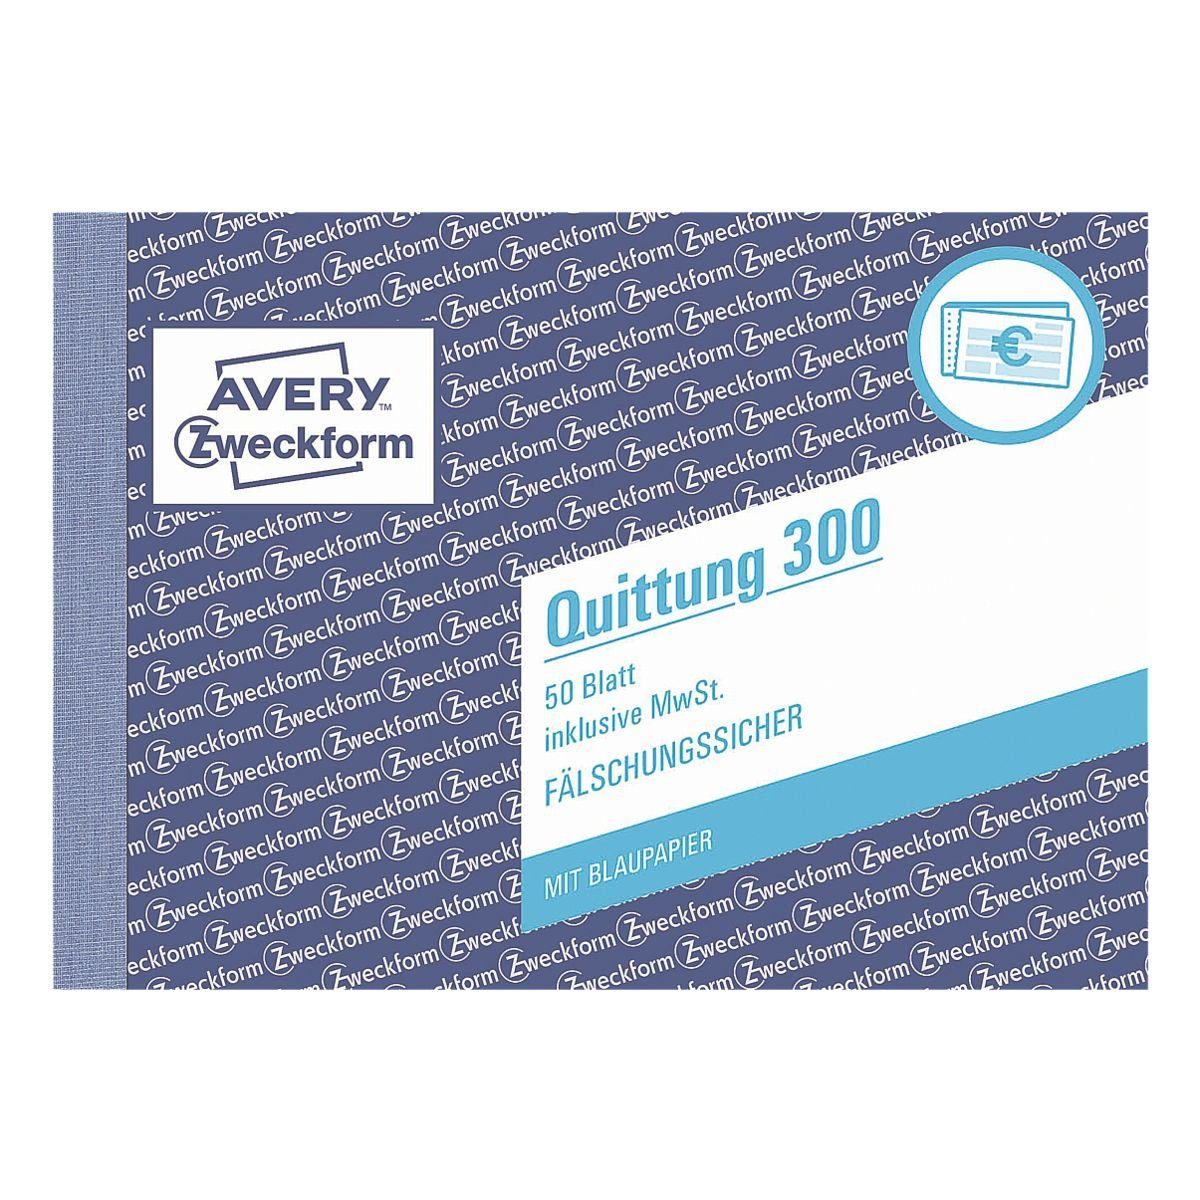 Avery Zweckform Formularbuch »Quittung inkl. MwSt.«